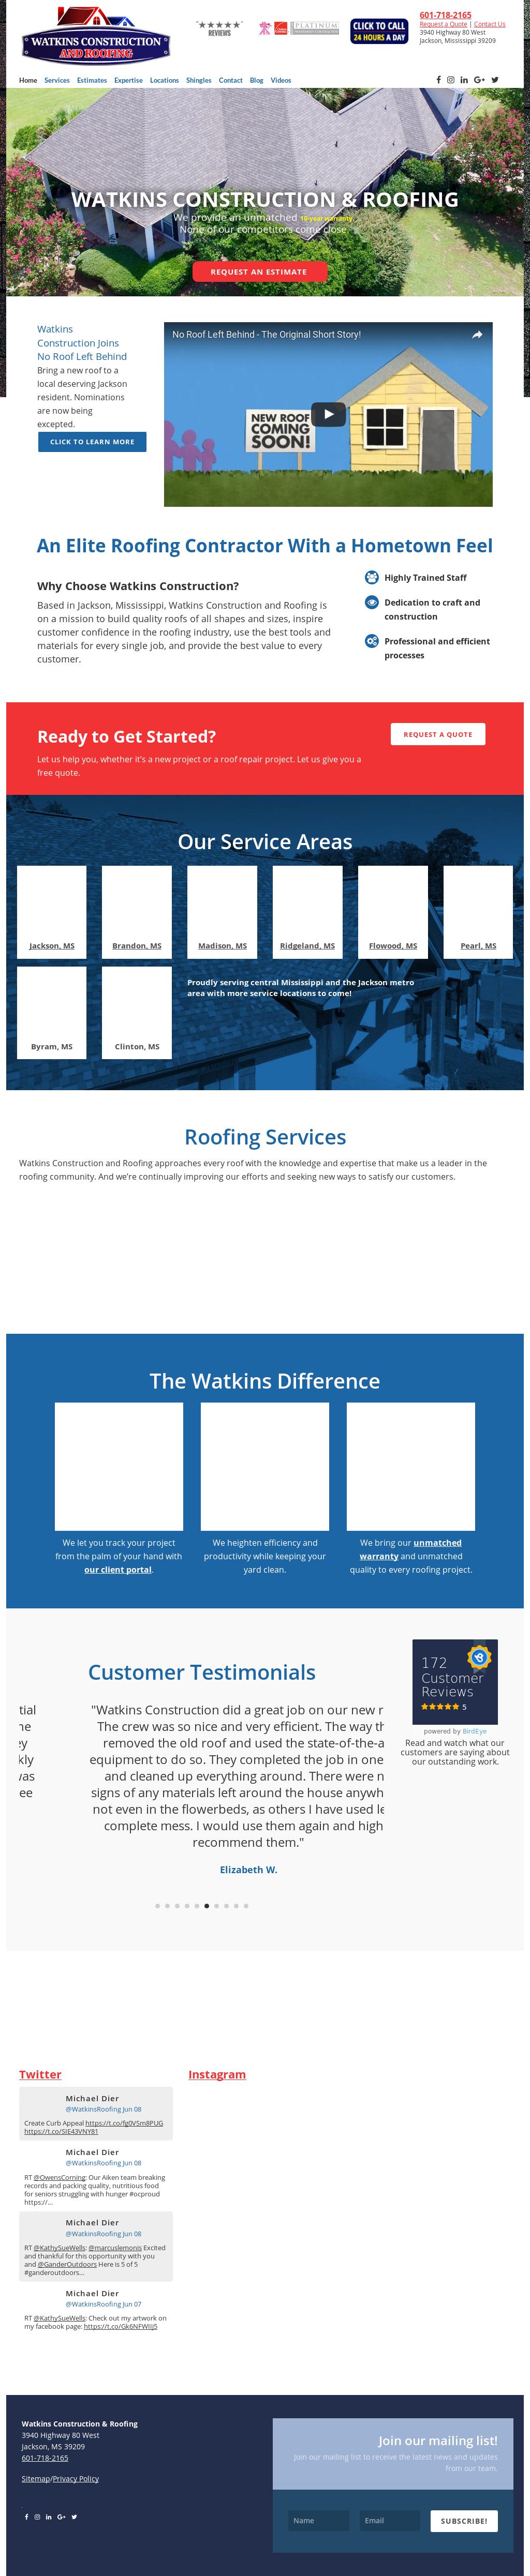 Watkins Construction Roofing Website History